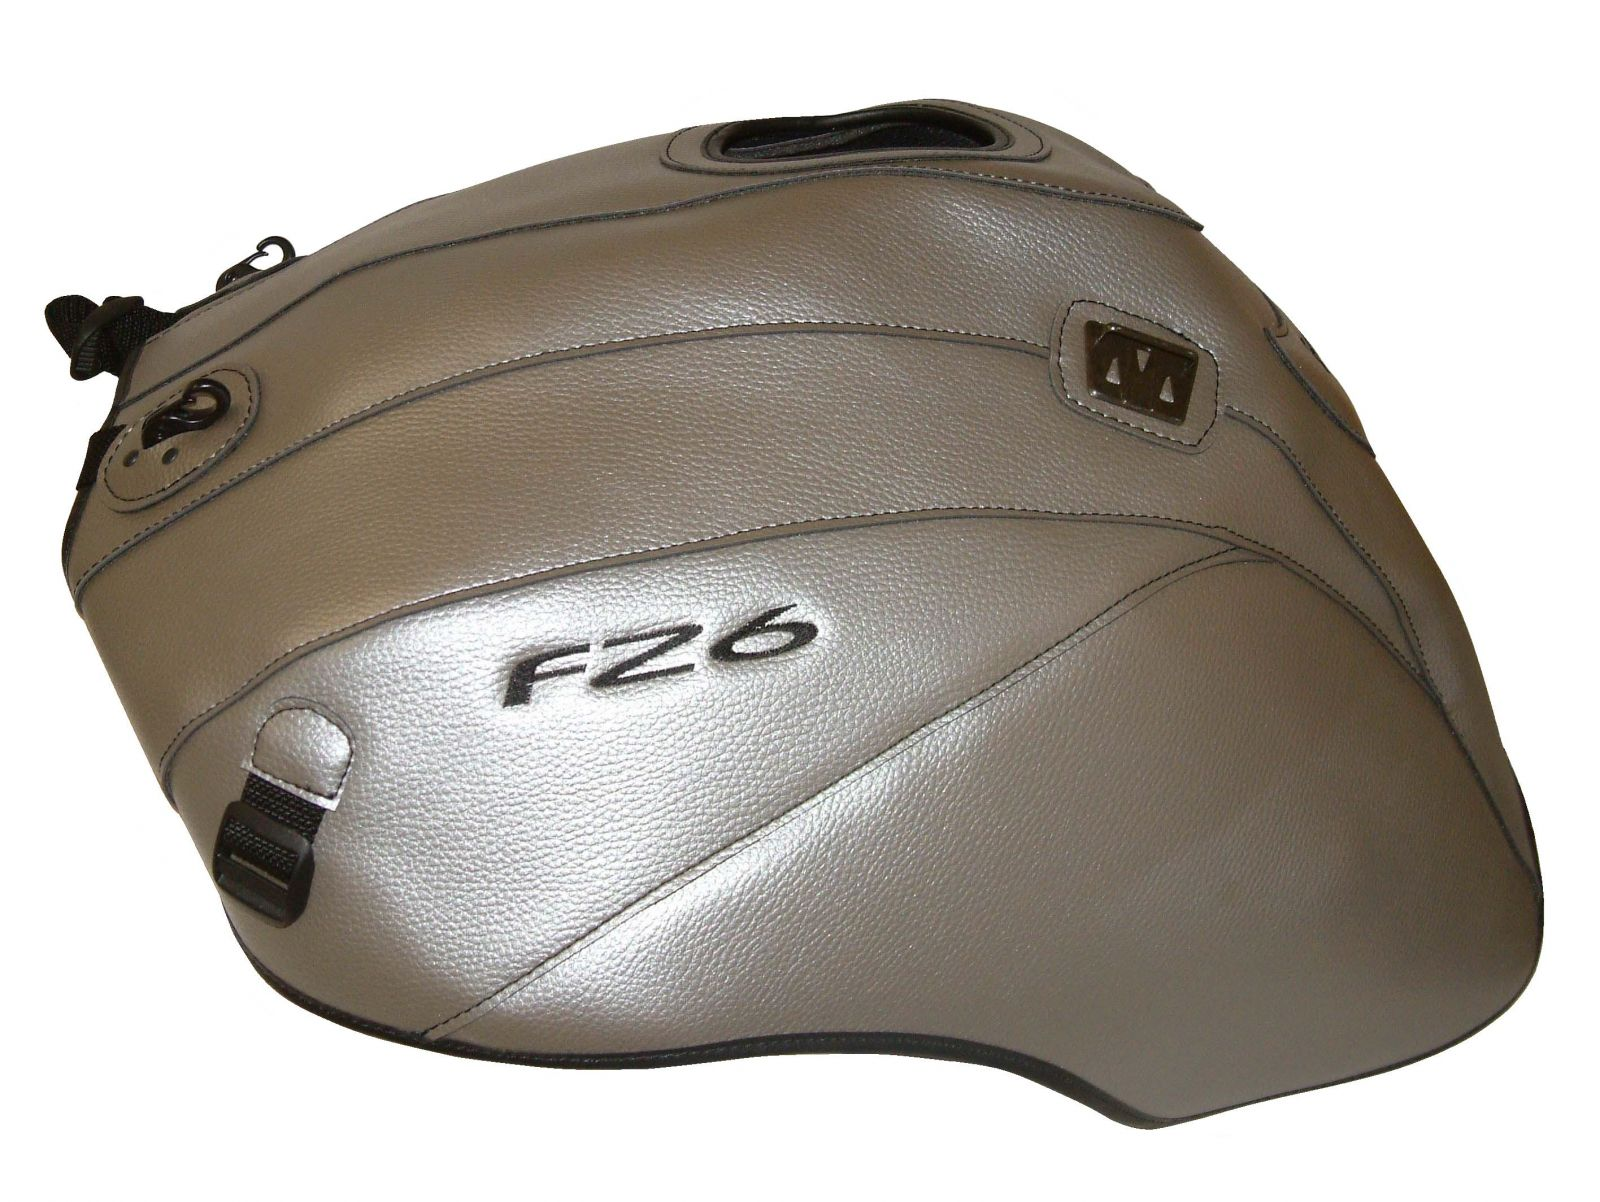 Tapis Prot Ge R Servoir Tpr4279 Yamaha Fz6 Fazer 600 2003 Tarifs Pour France